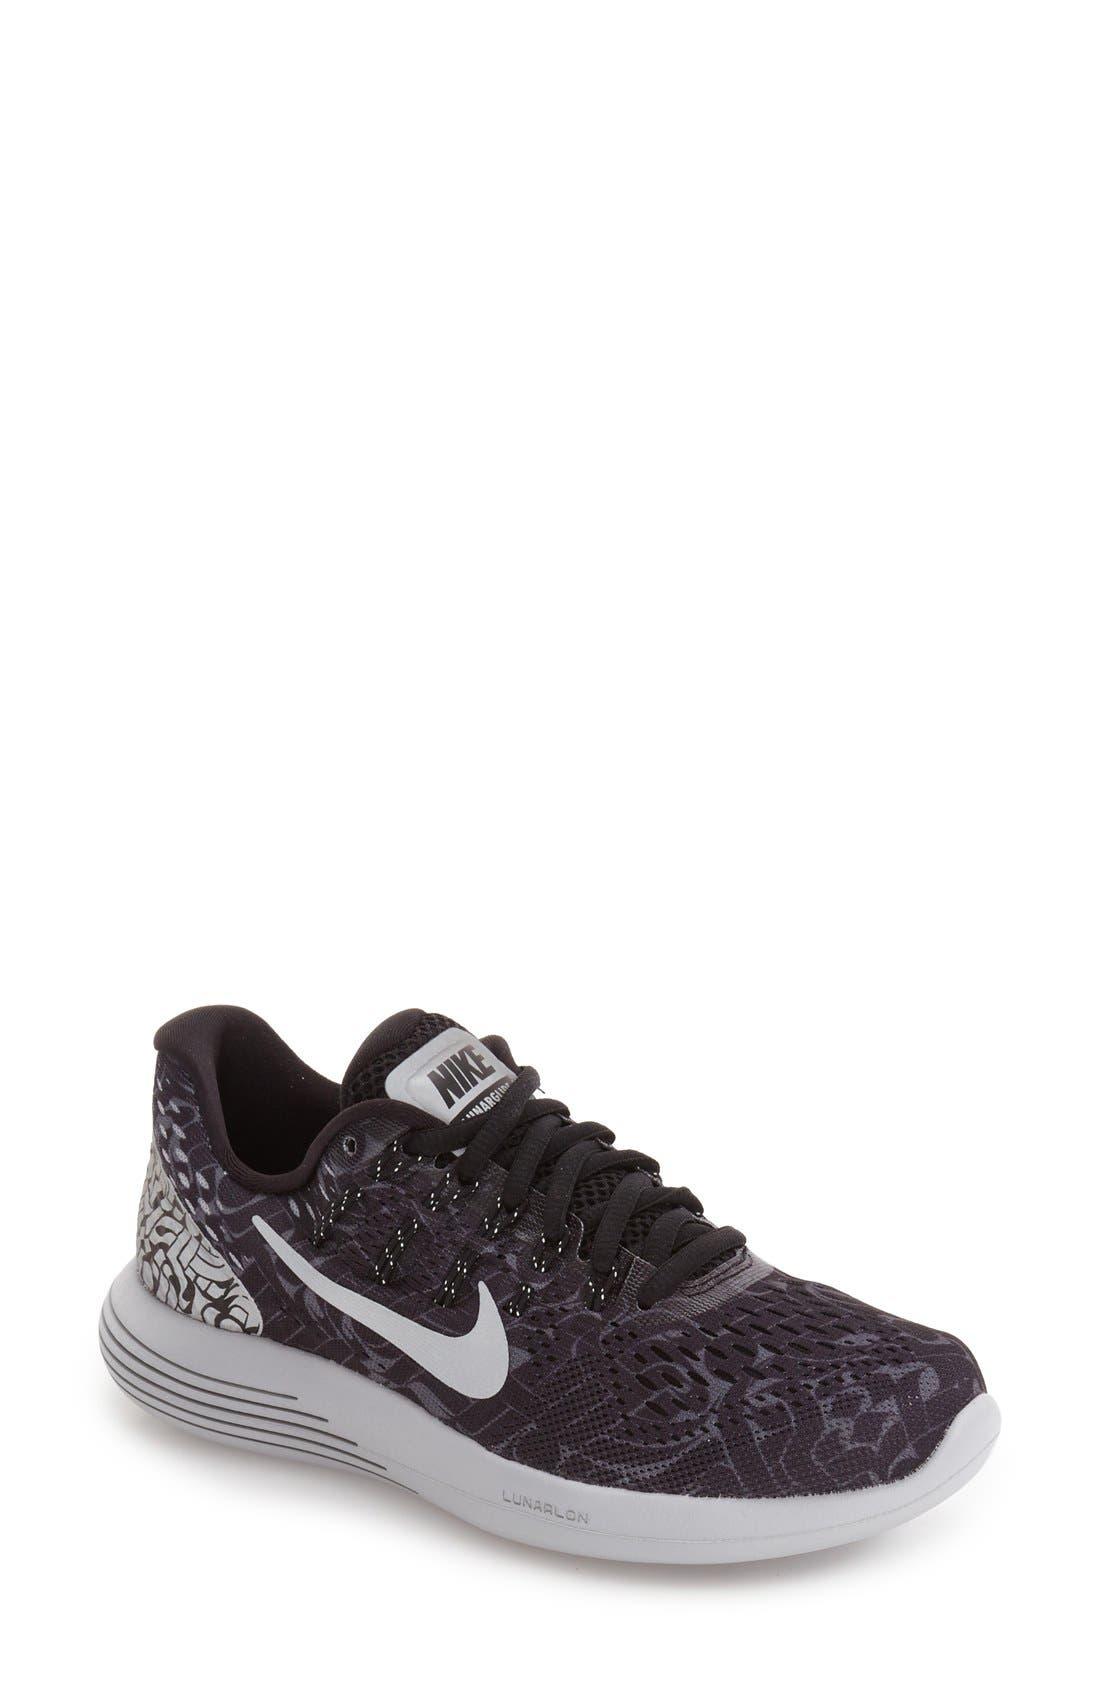 Alternate Image 1 Selected - Nike Rostarr LunarGlide 8 Running Shoe (Women)